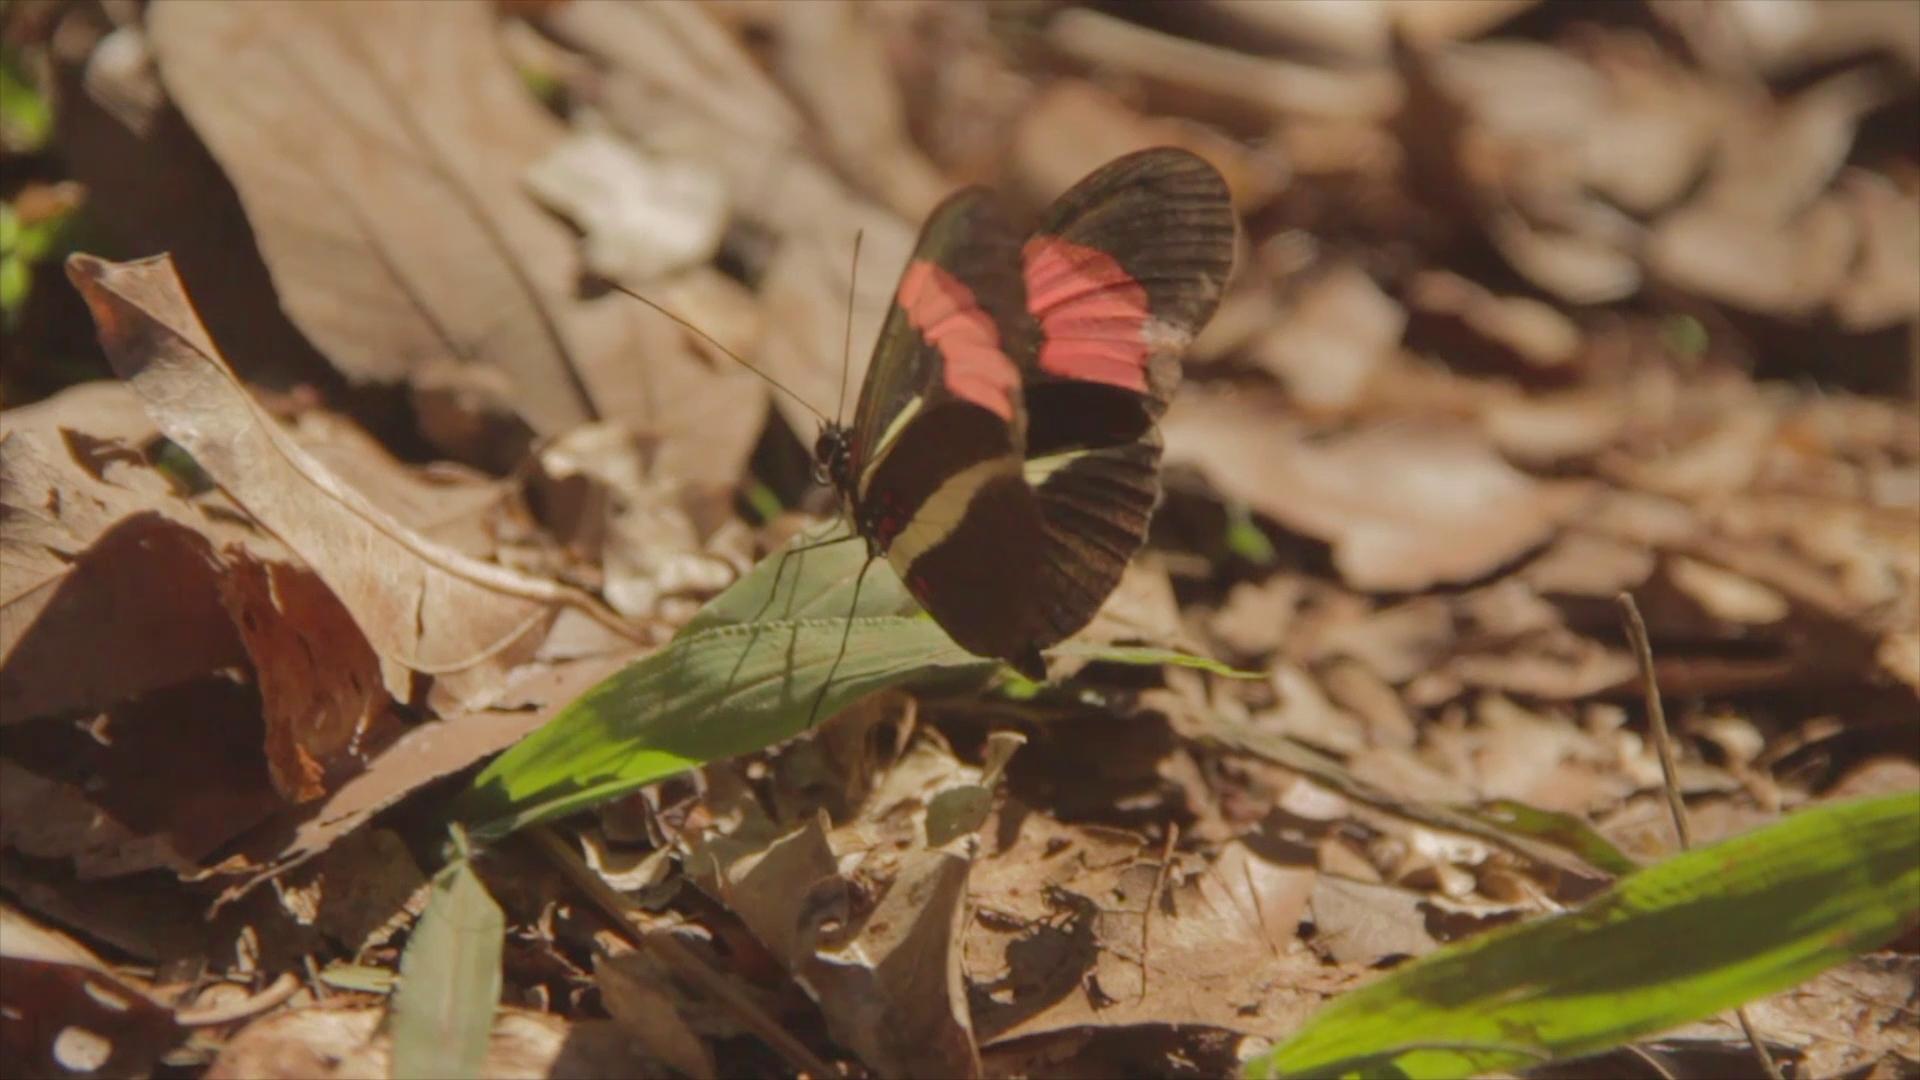 mito iguazu mariposa pablocaminante - Audiovisual